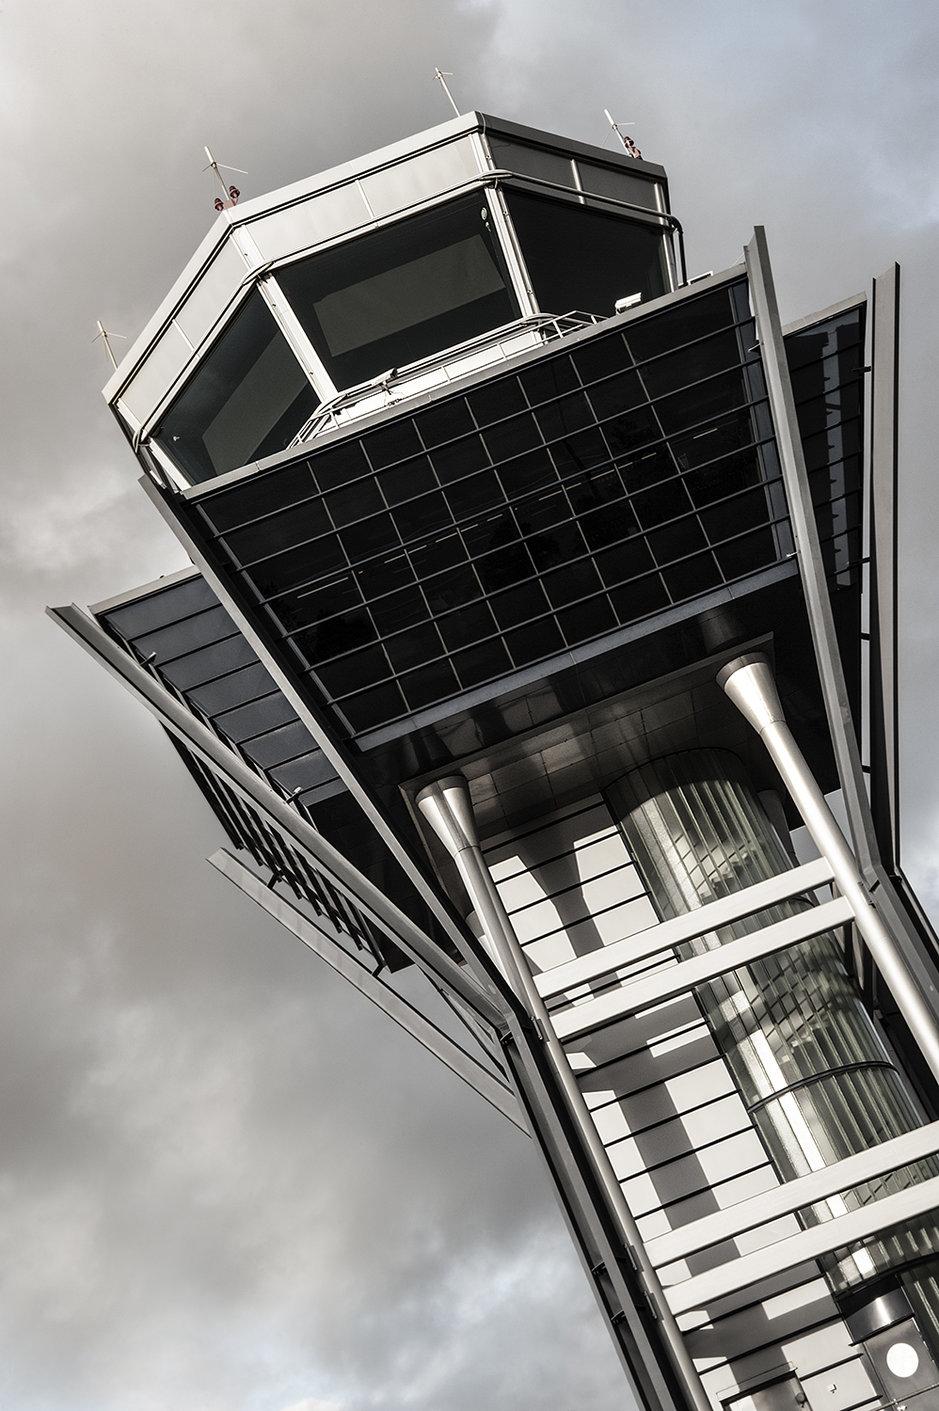 Oulun lennonjohtotorni. Kuva: CarolynRusso